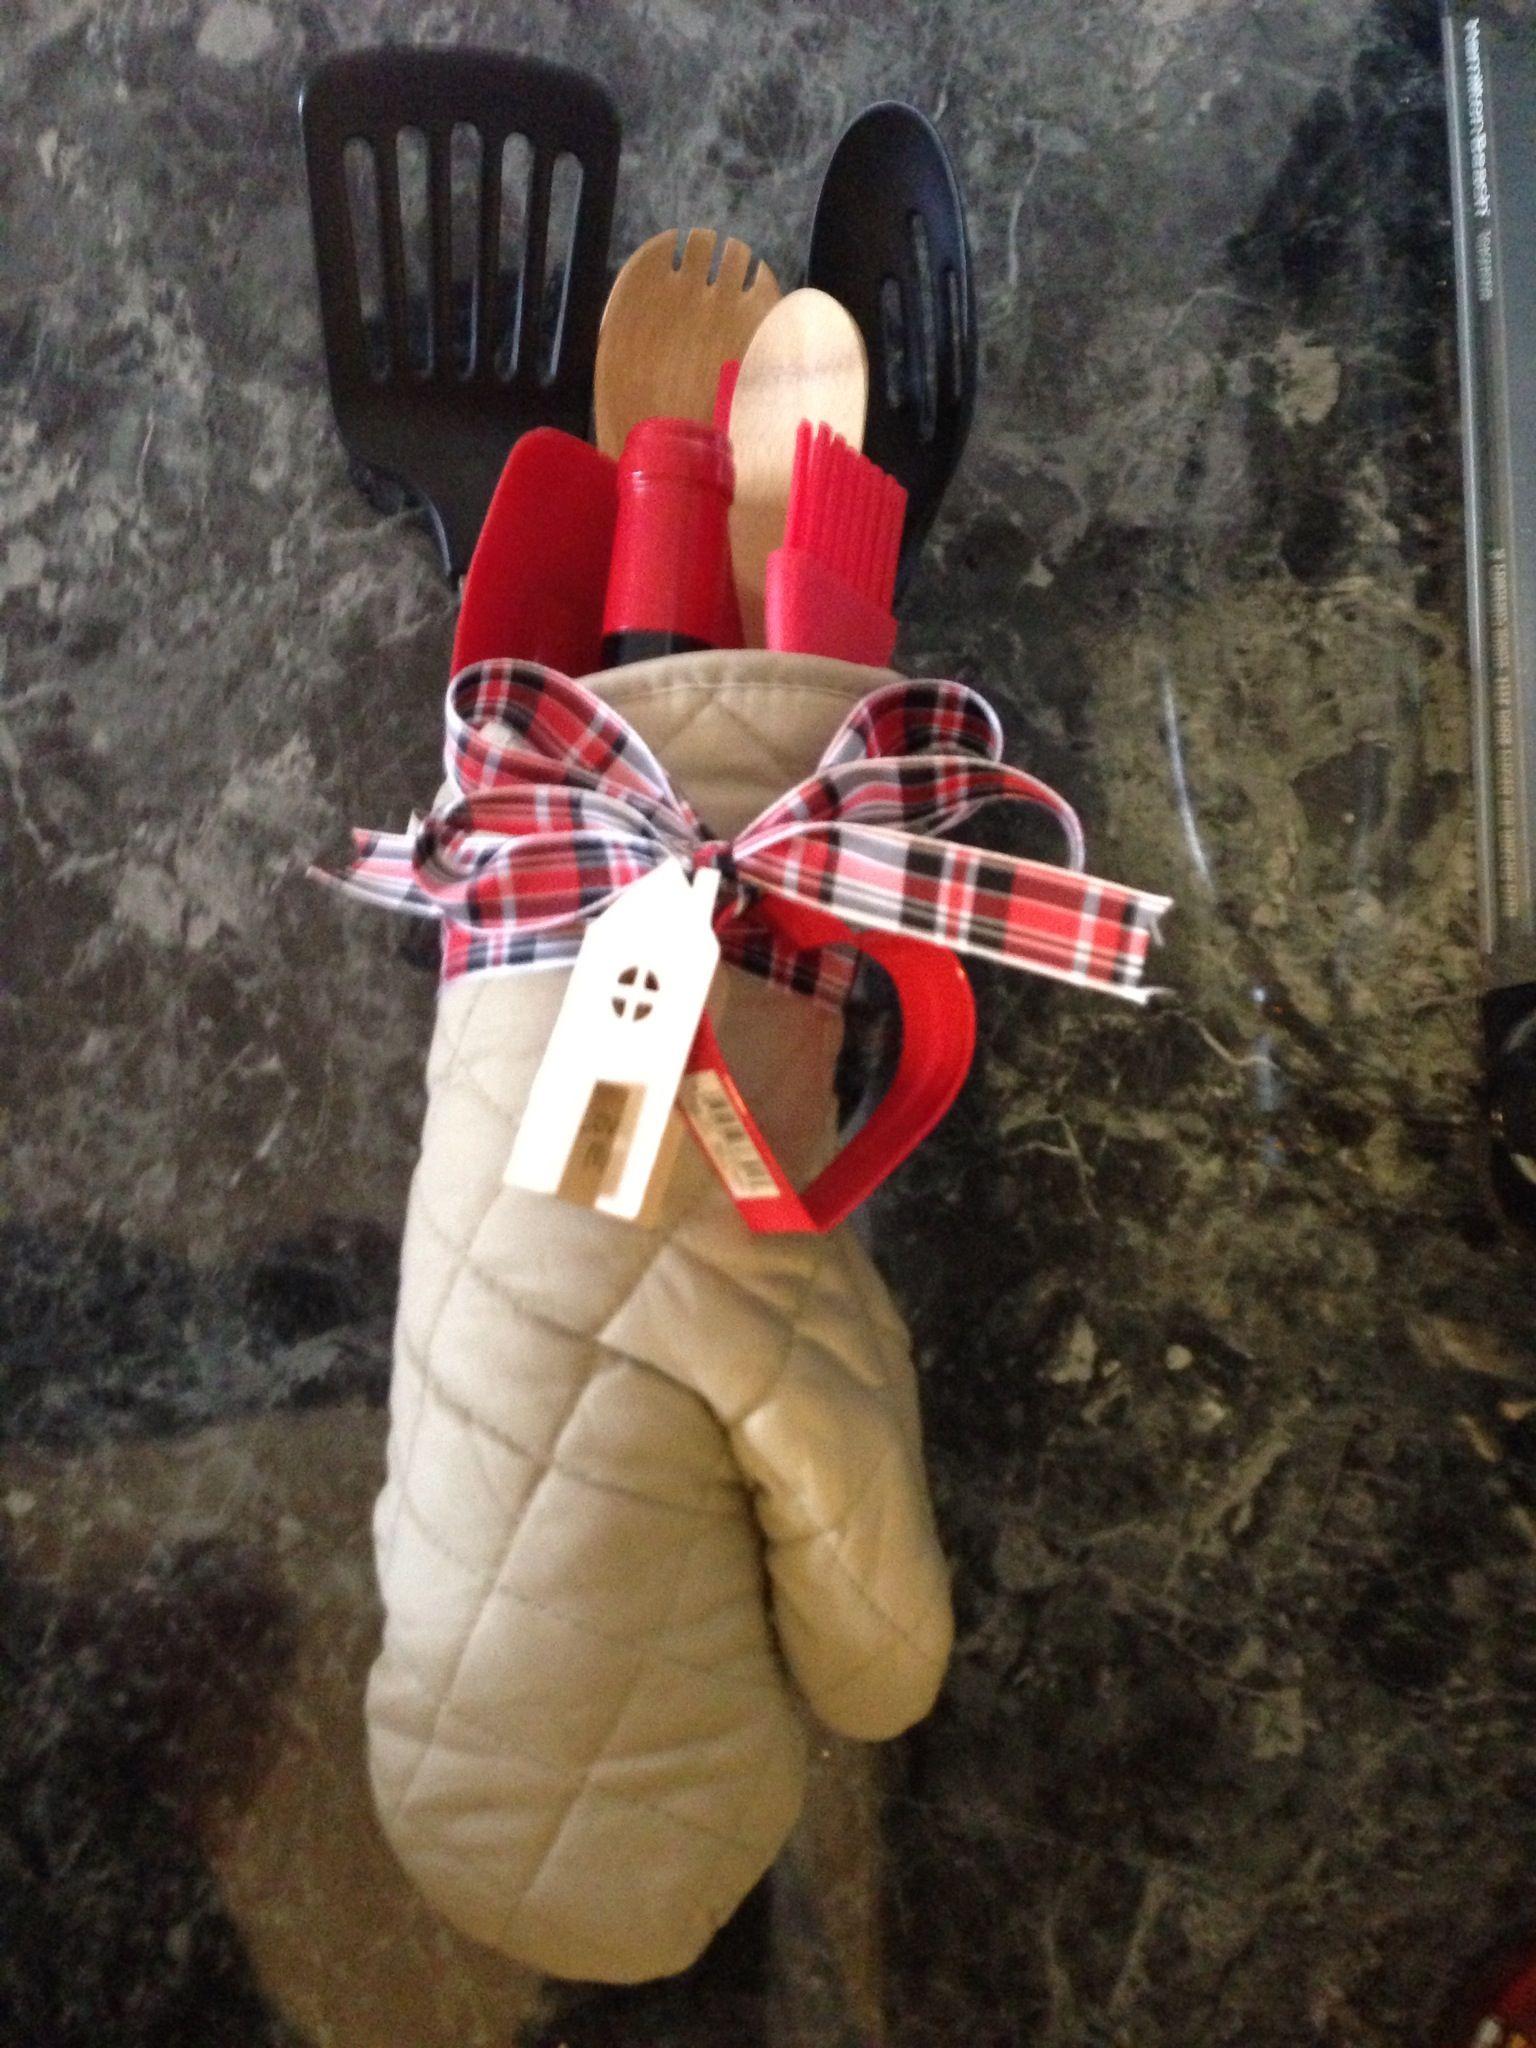 Housewarming Gift bottle of wine & kitchen utensils in